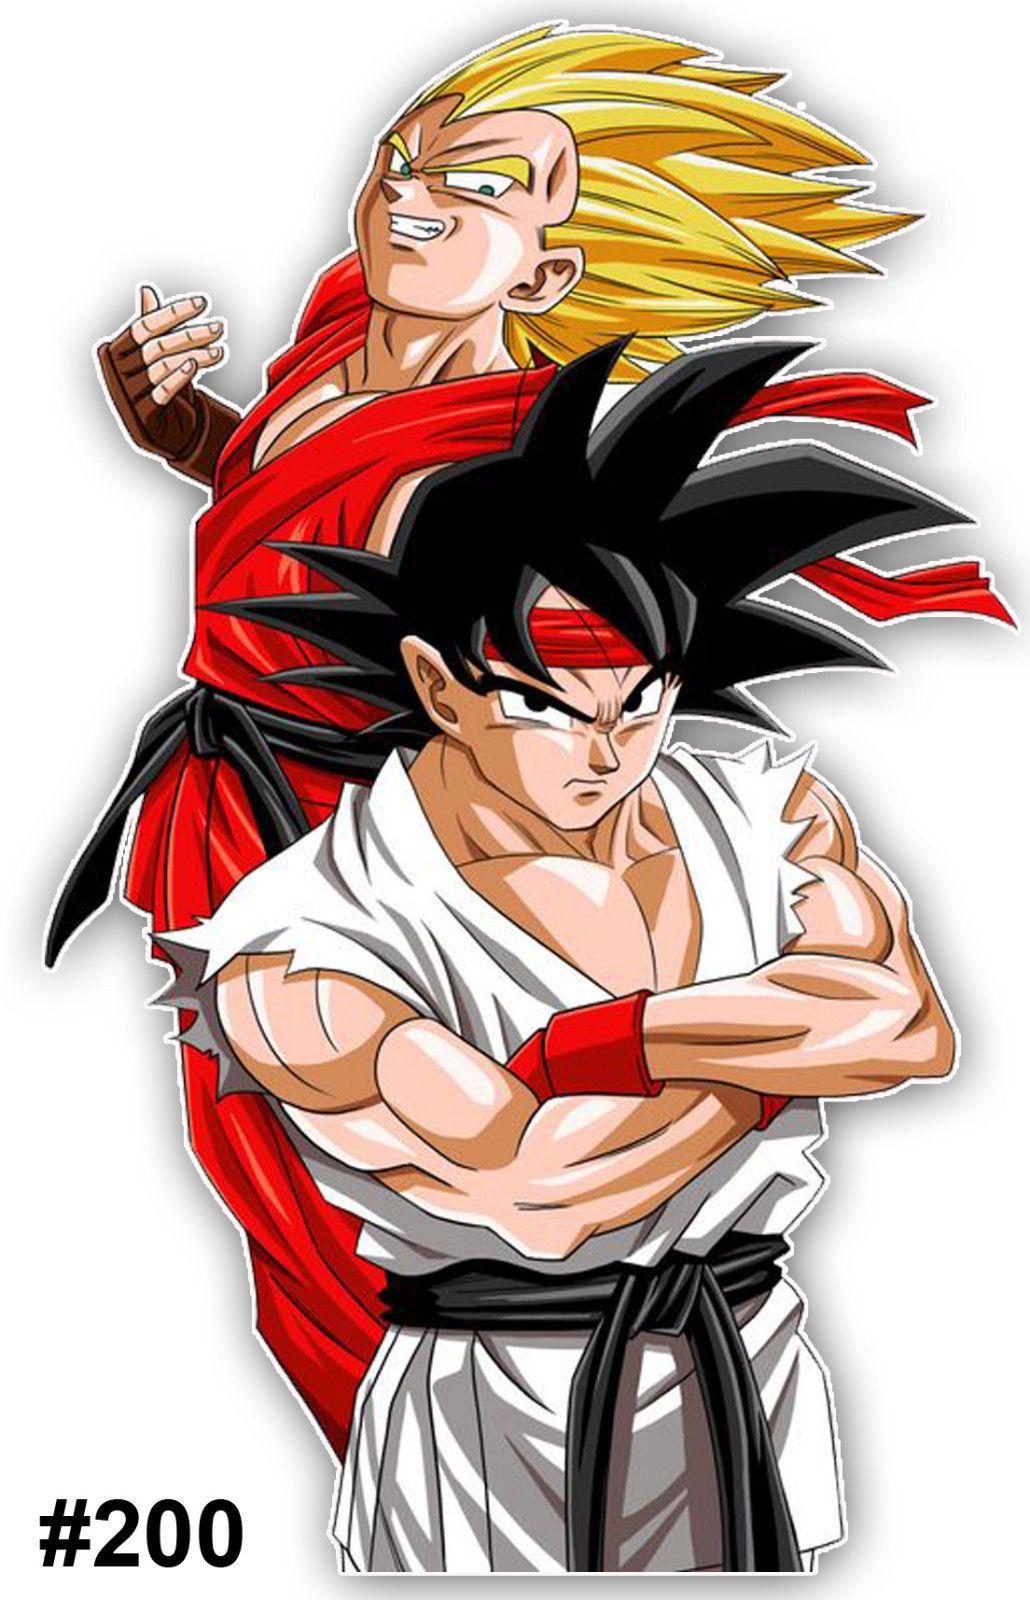 Dragon Ball Z Son Goku Vegeta Vinyl Die-Cut Sticker Decal Funny JDM Japan Anime